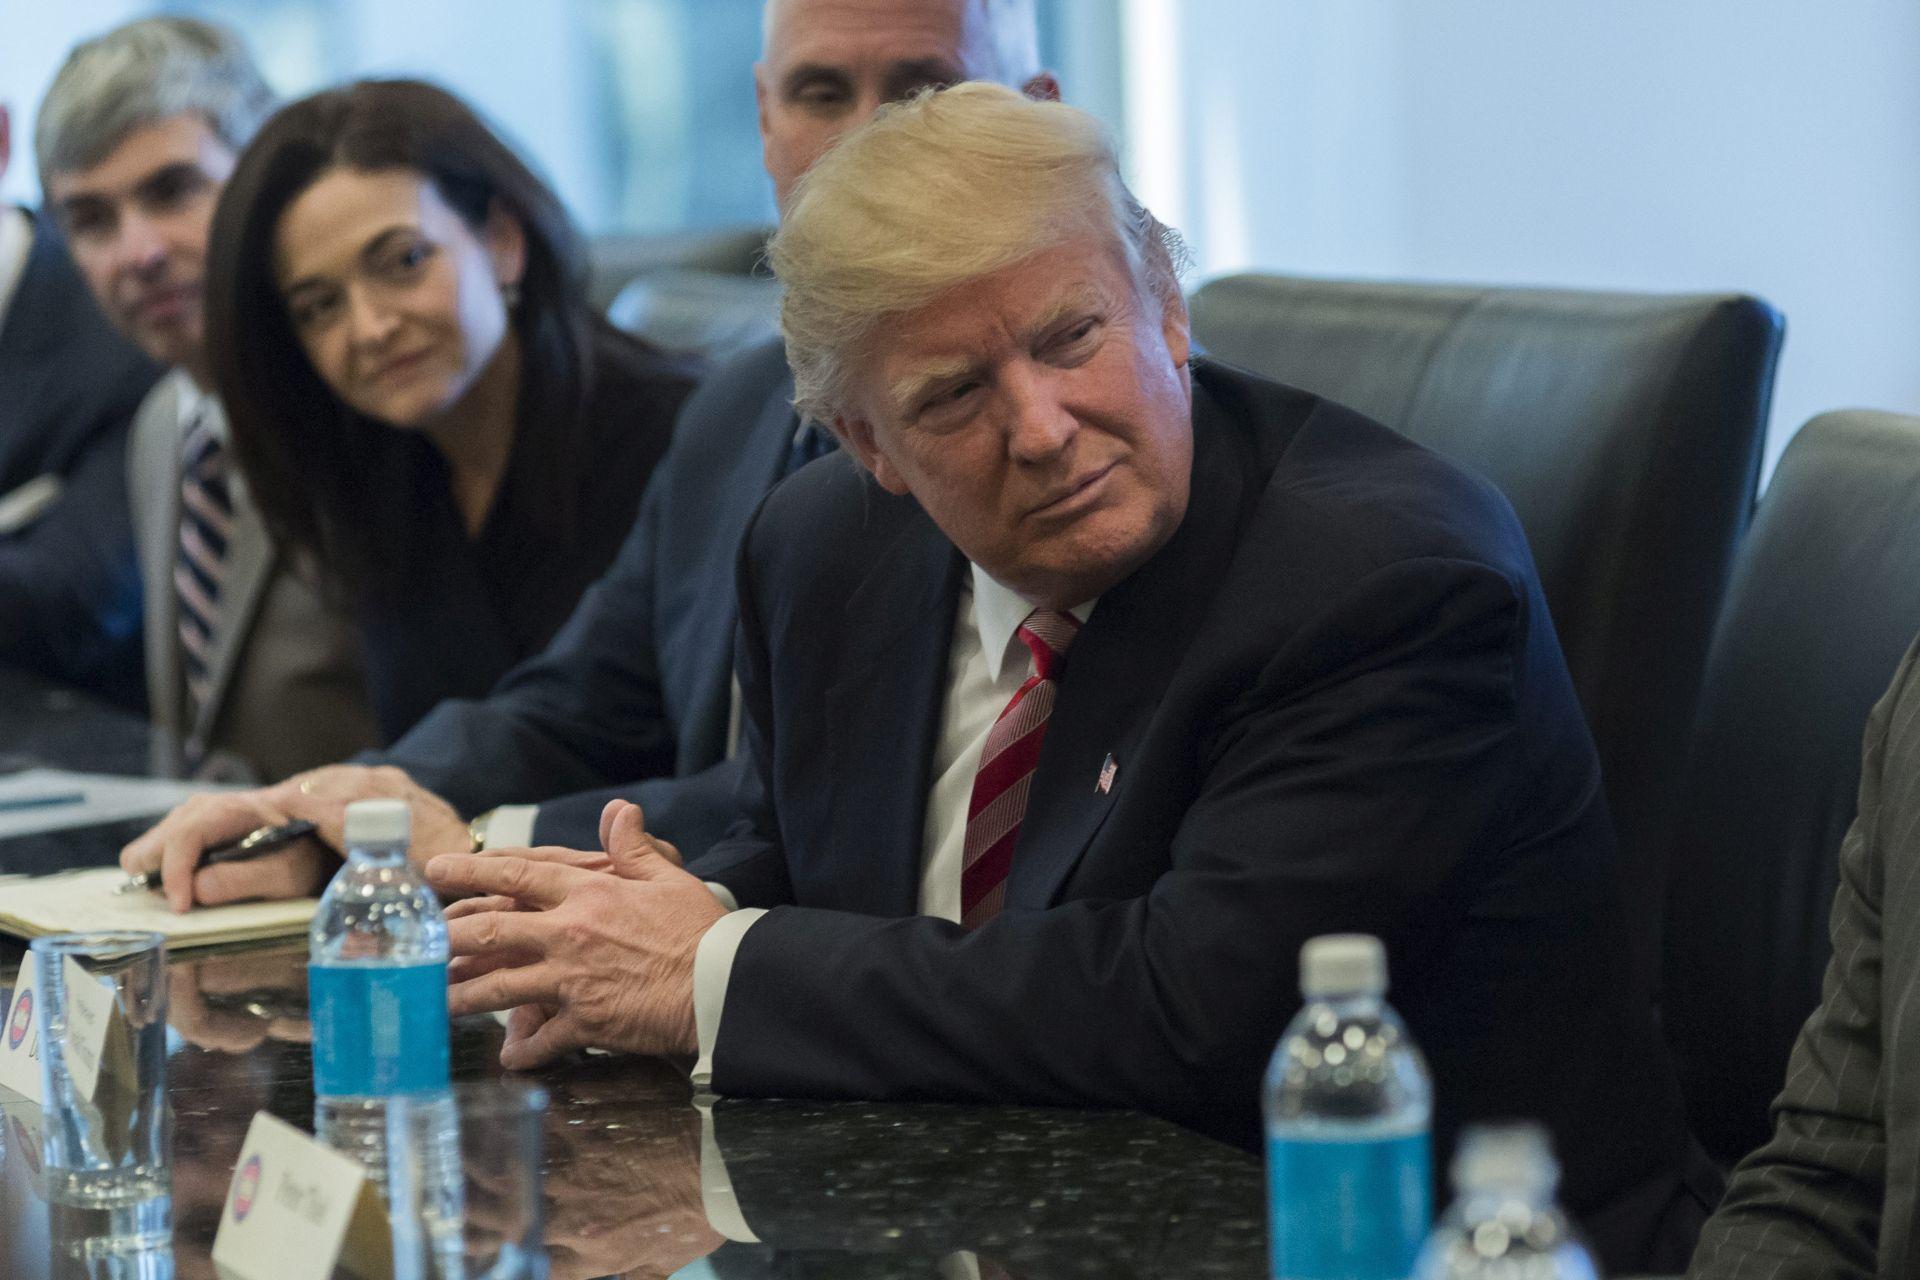 Imenovani Trumpov glasnogovornik odustao nakon dva dana